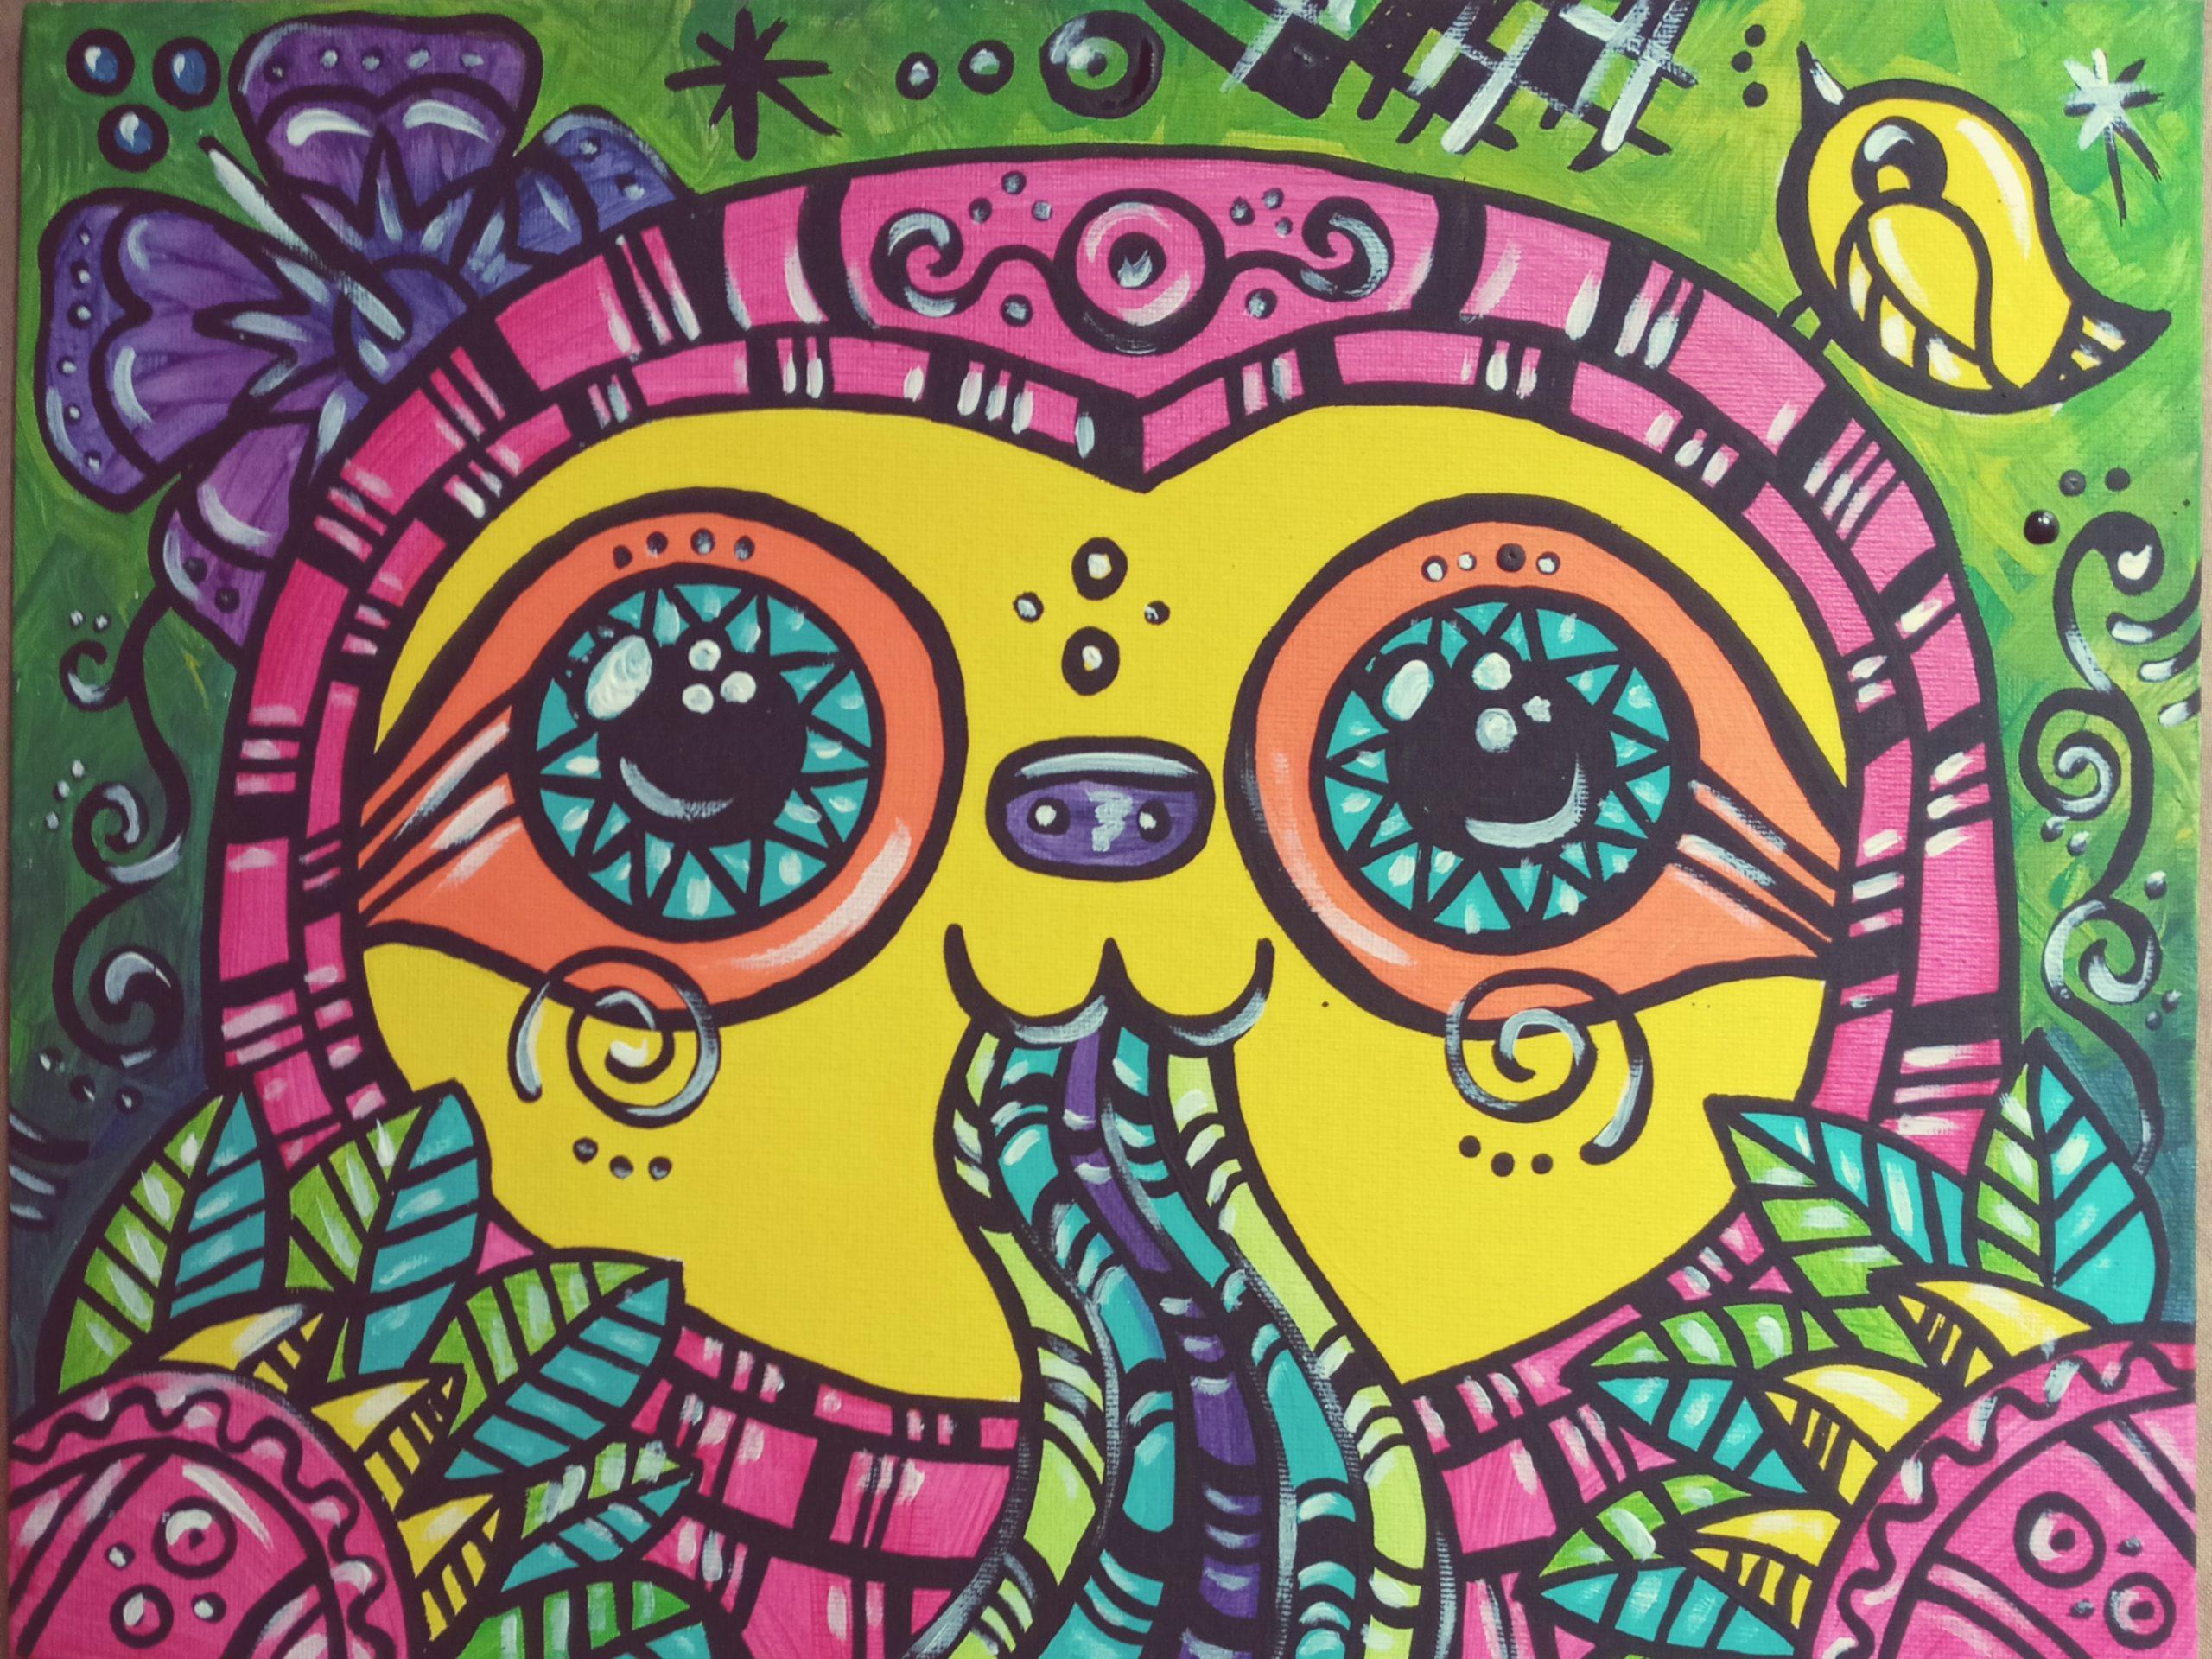 sloth art